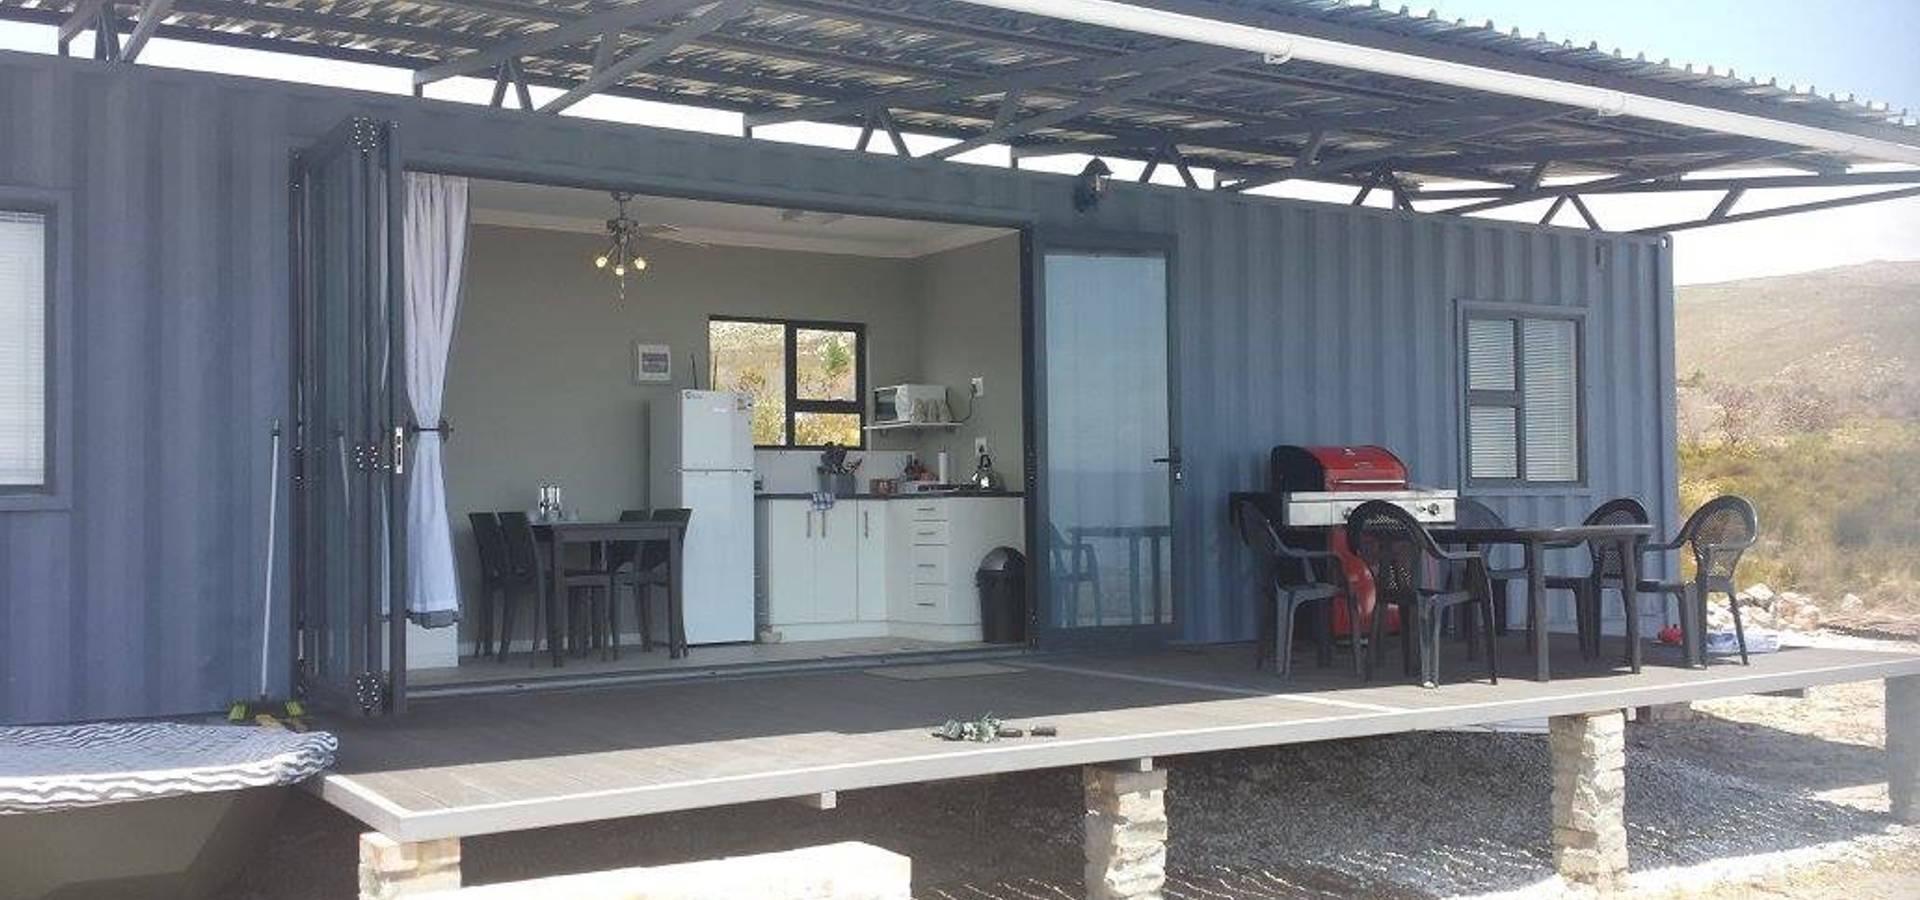 Berman-Kalil Housing Concepts